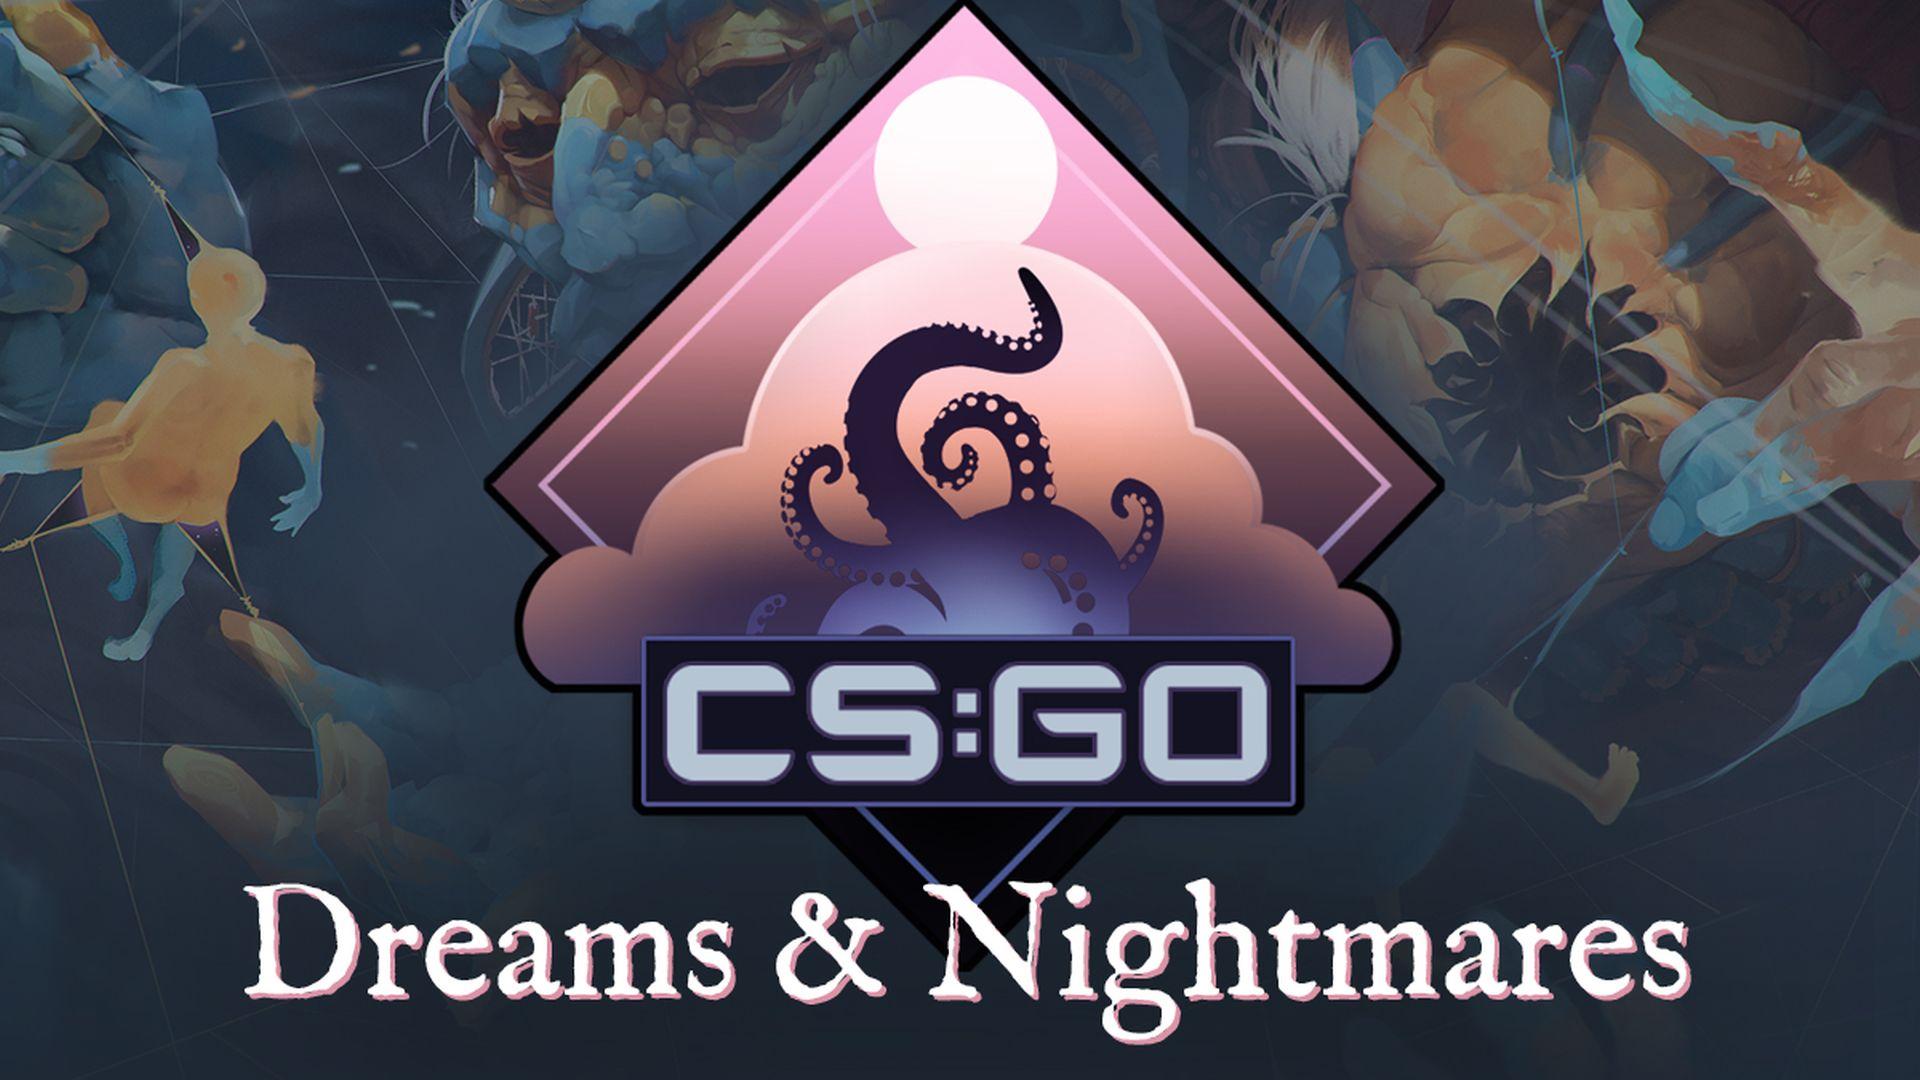 CS:GO devs launch 'Dreams and Nightmares' $1 million art contest